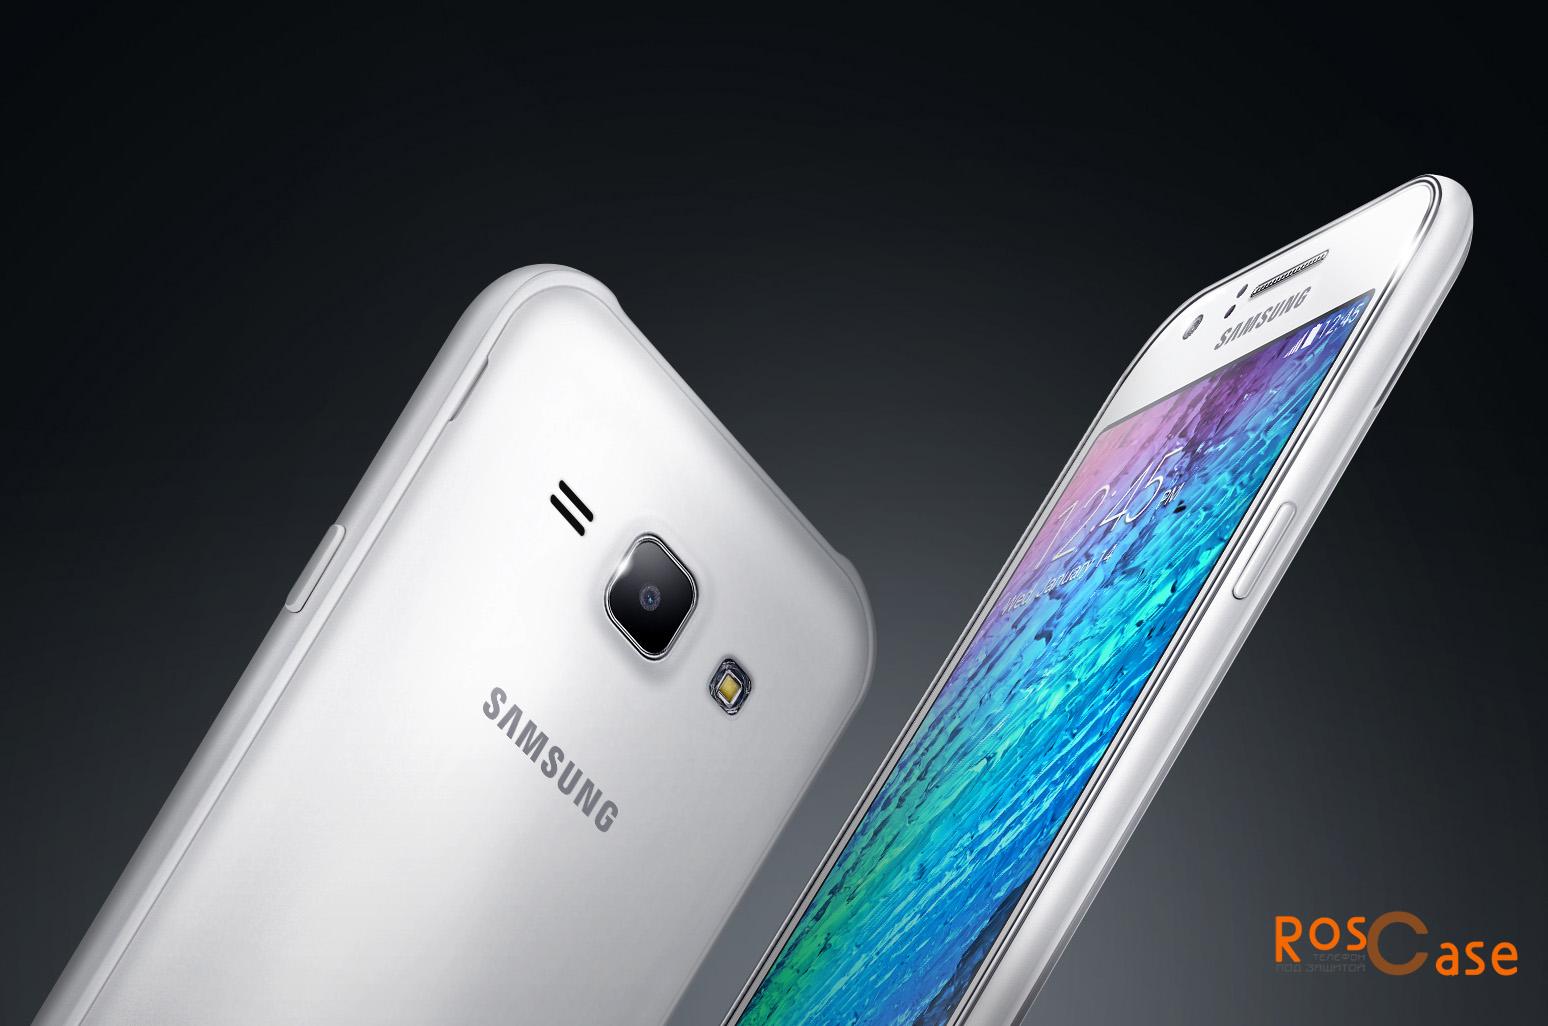 Galaxy J1 Duos внутренняя комплектация